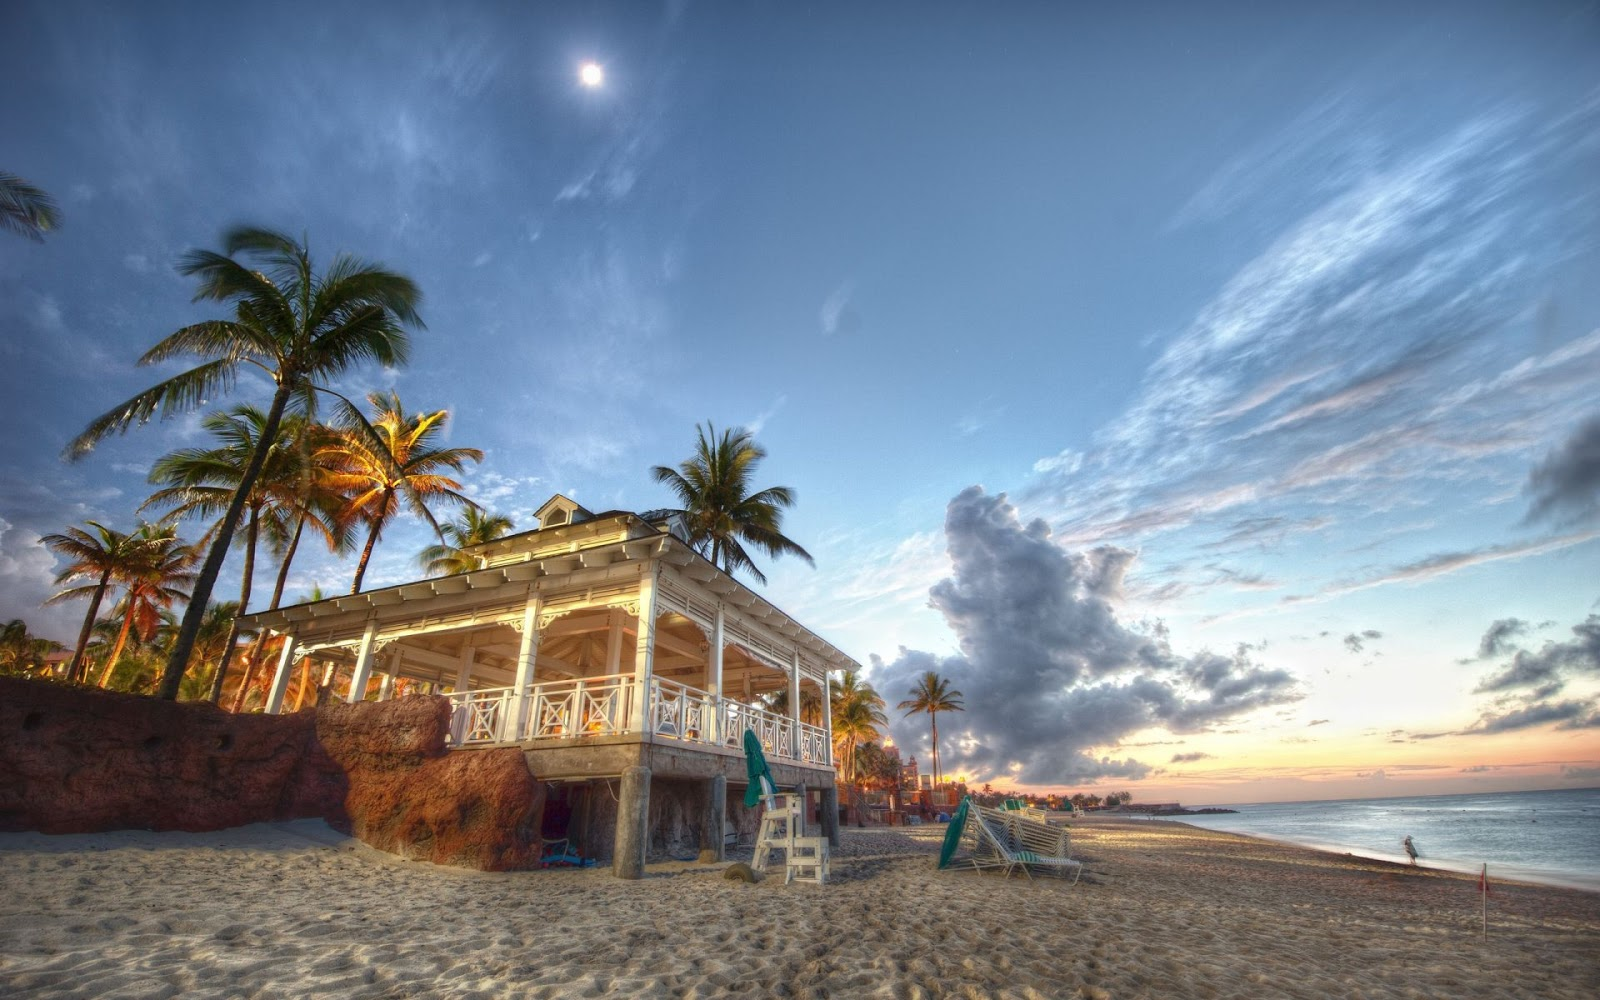 Beach House in Nassau Bahamas Full HD Desktop Wallpapers 1080p 1600x1000